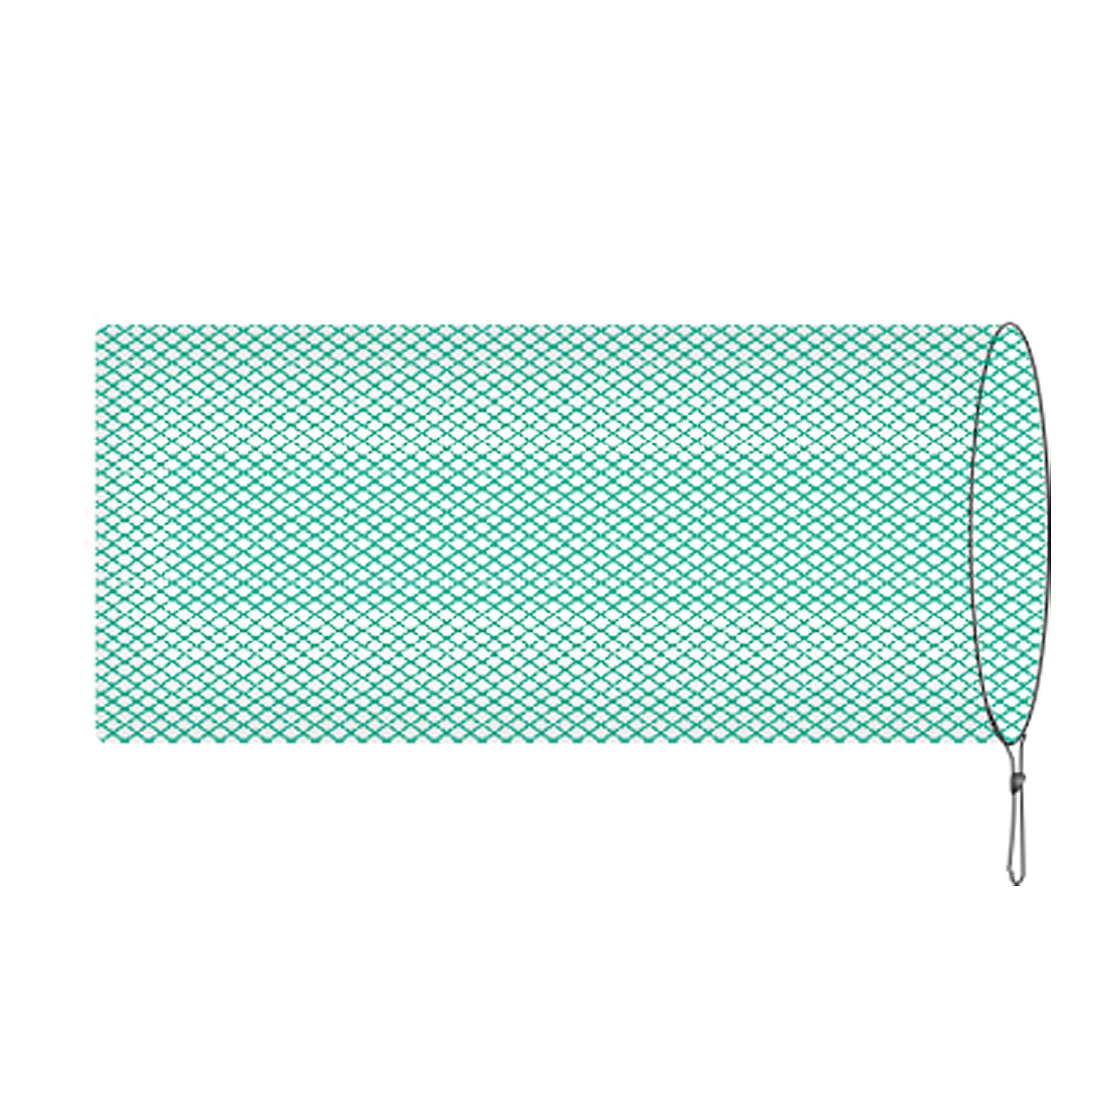 Minnow Fishing Holding Bag Drawstring Fish Keep Net